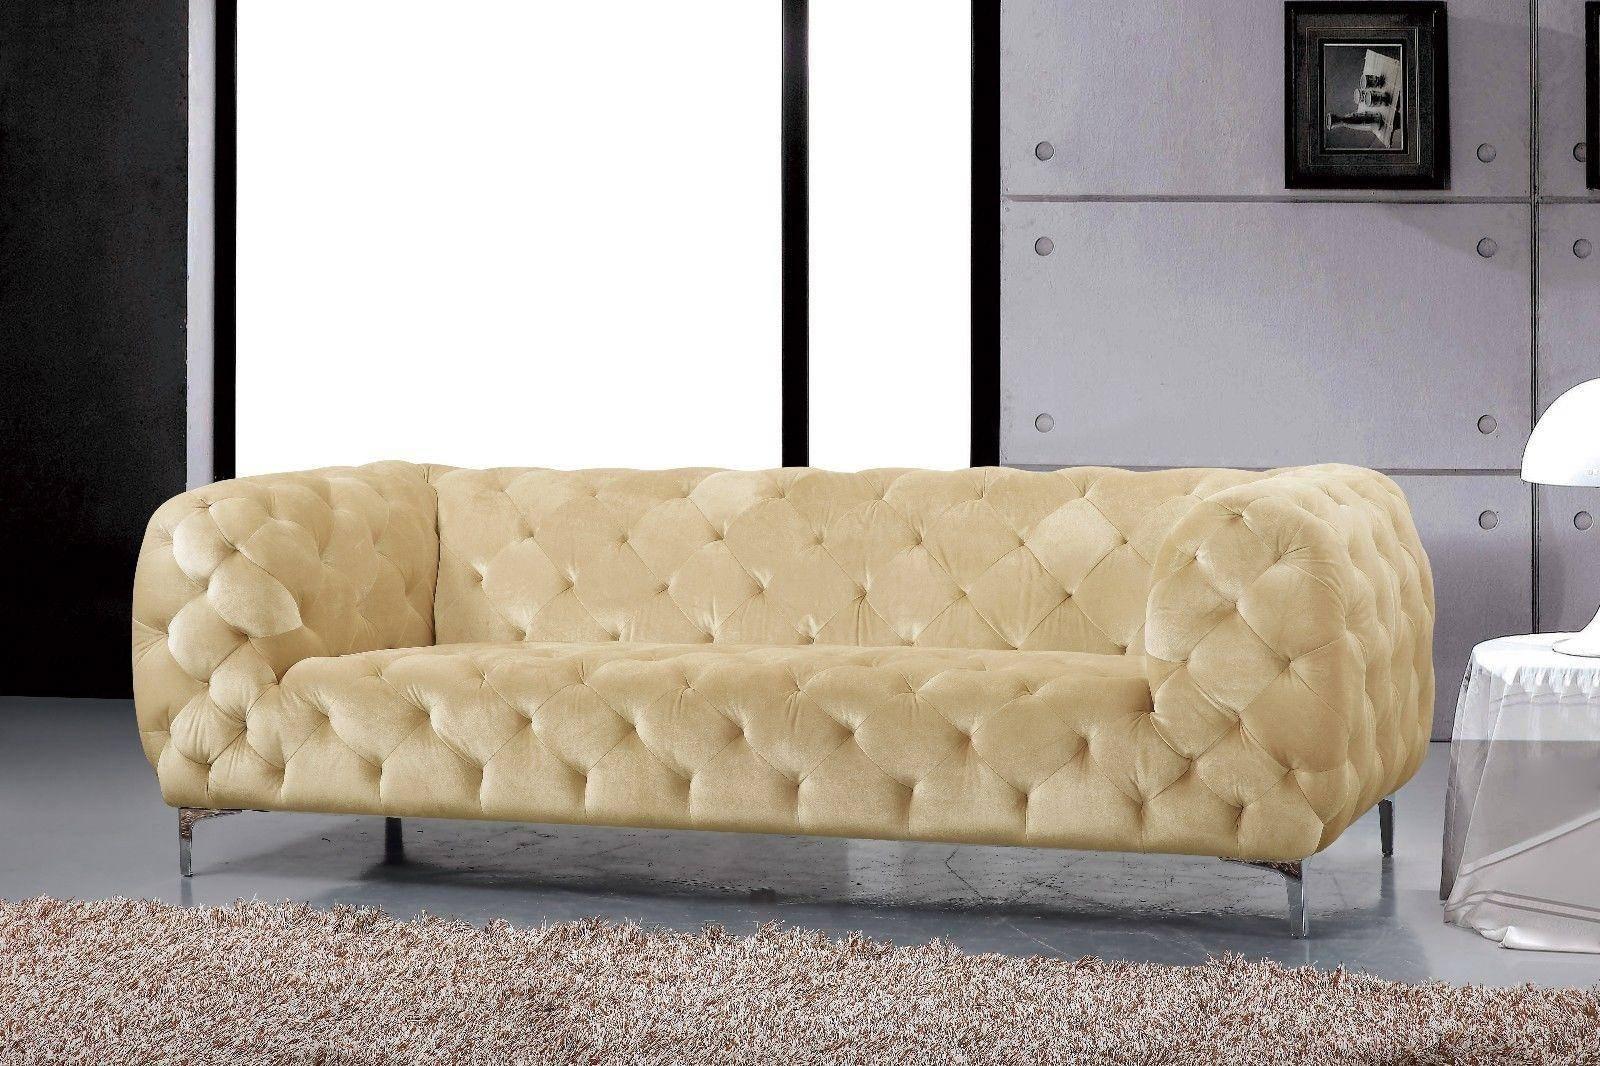 Picture of: Buy Meridian Mercer Sofa Loveseat And Chair Set 3 Pcs In Beige Velvet Online